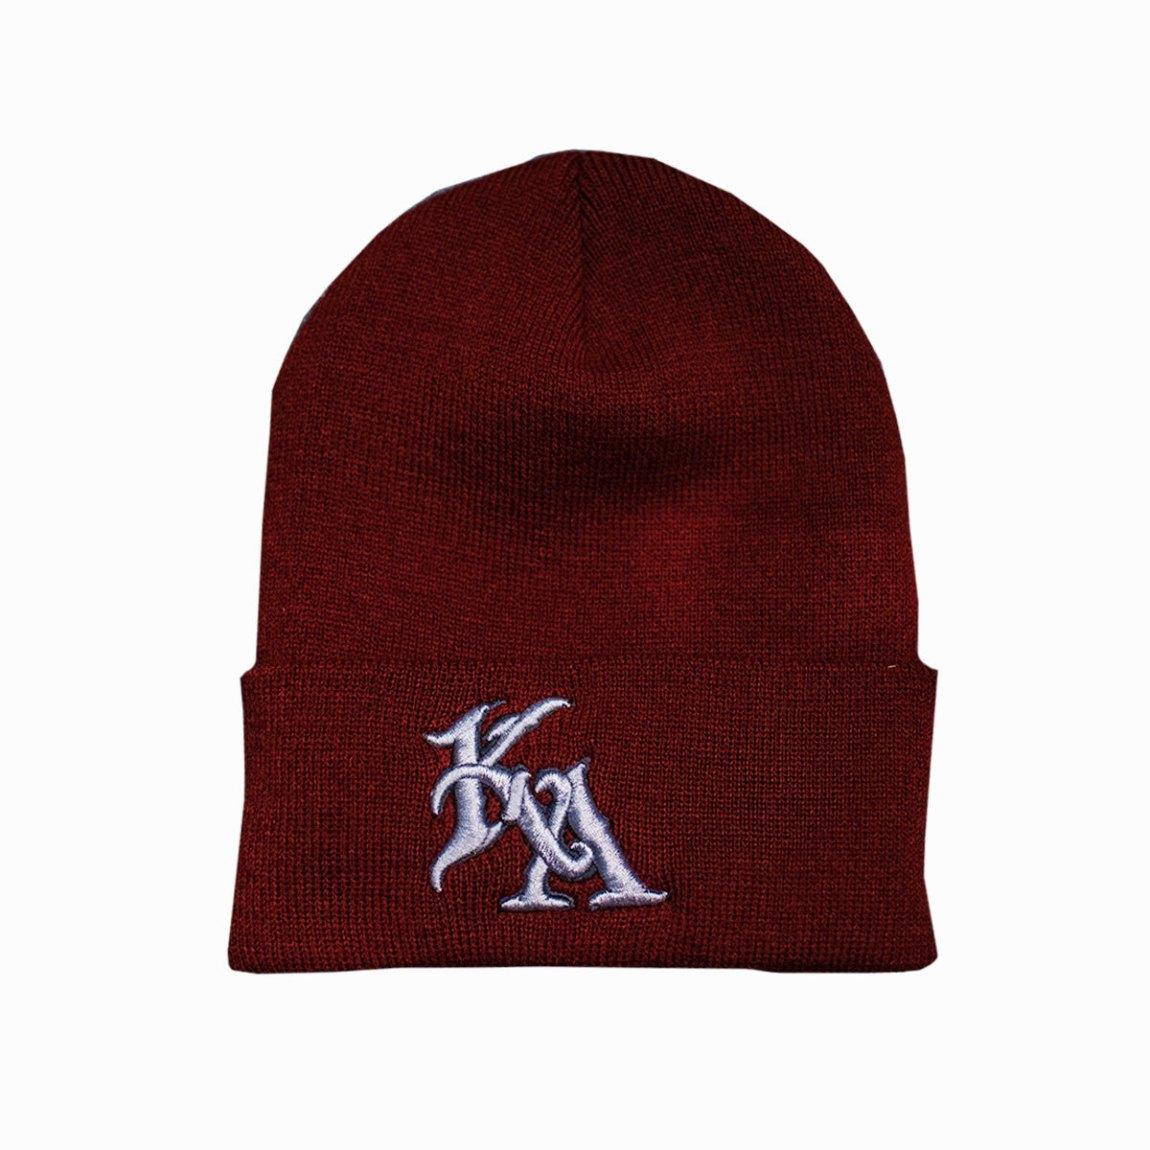 Maroon Knit 00155